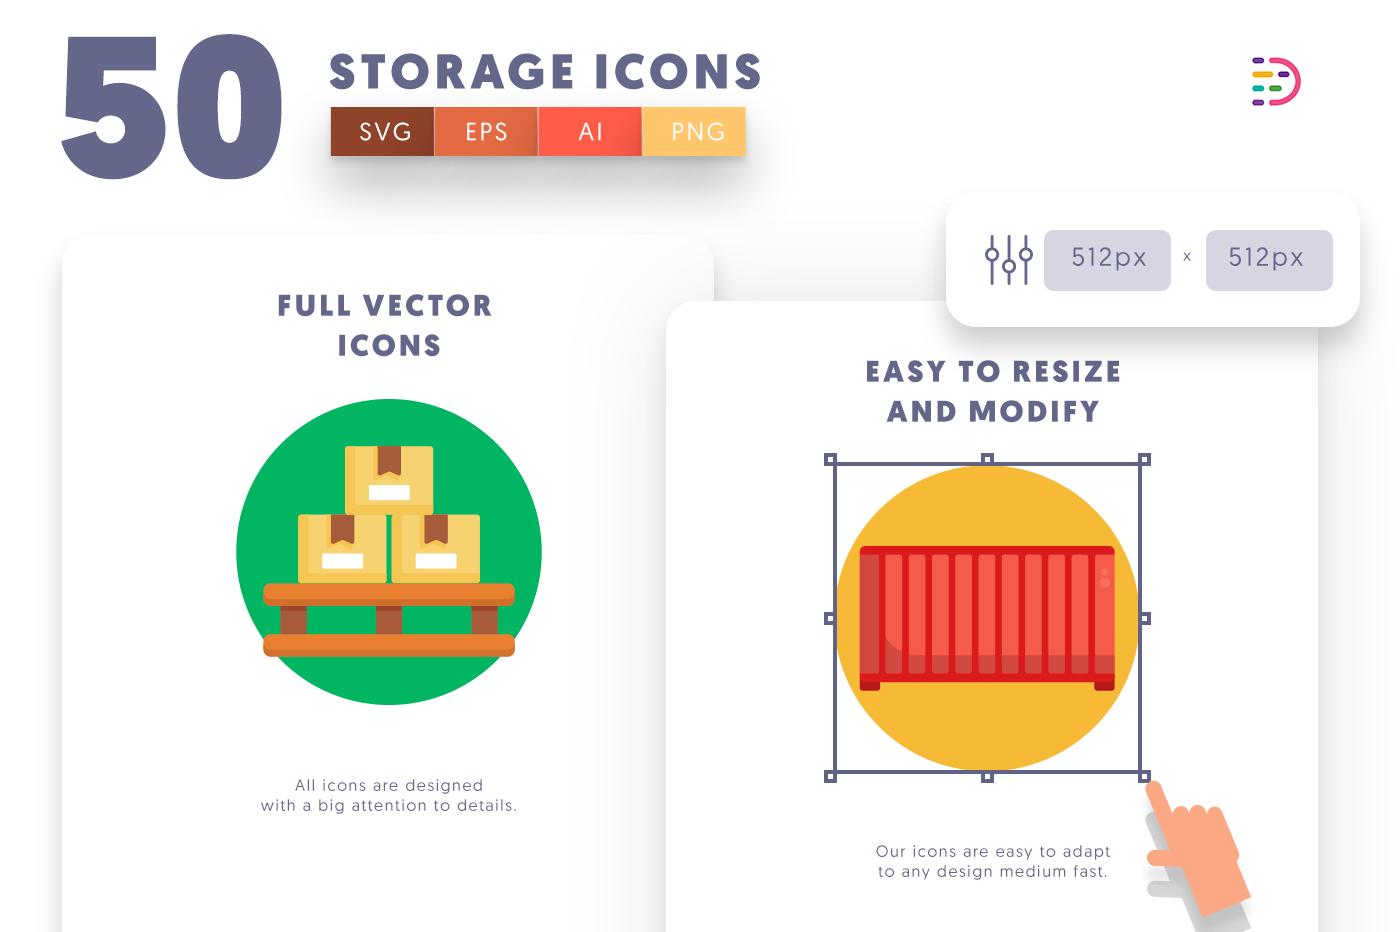 Full vector 50Storage Icons